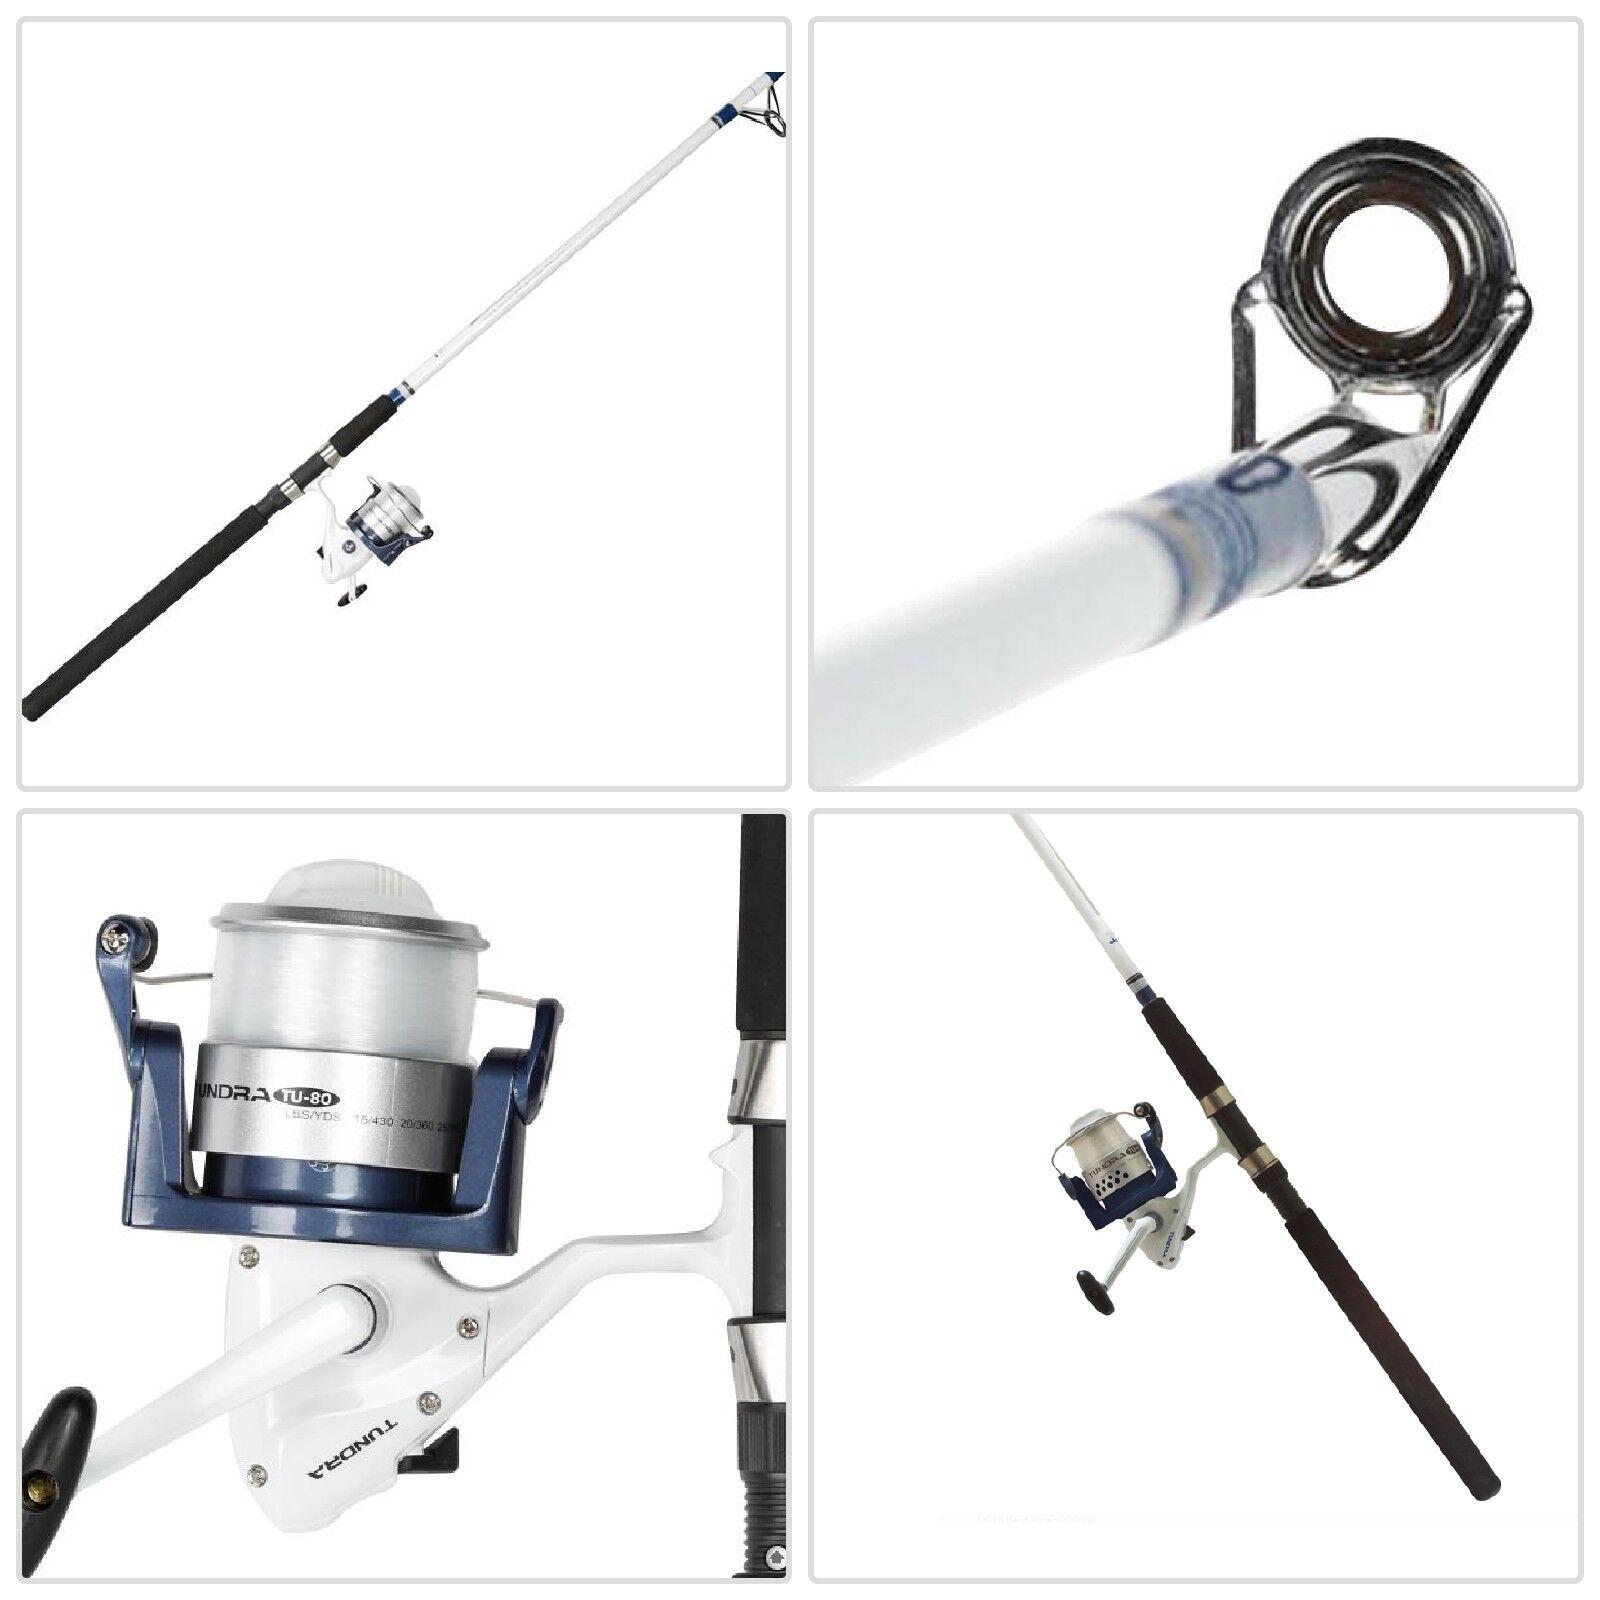 Okuma Tundra Surf Fishing Rod Combo Saltwater Spinning Reel Durable Fiber 10FT